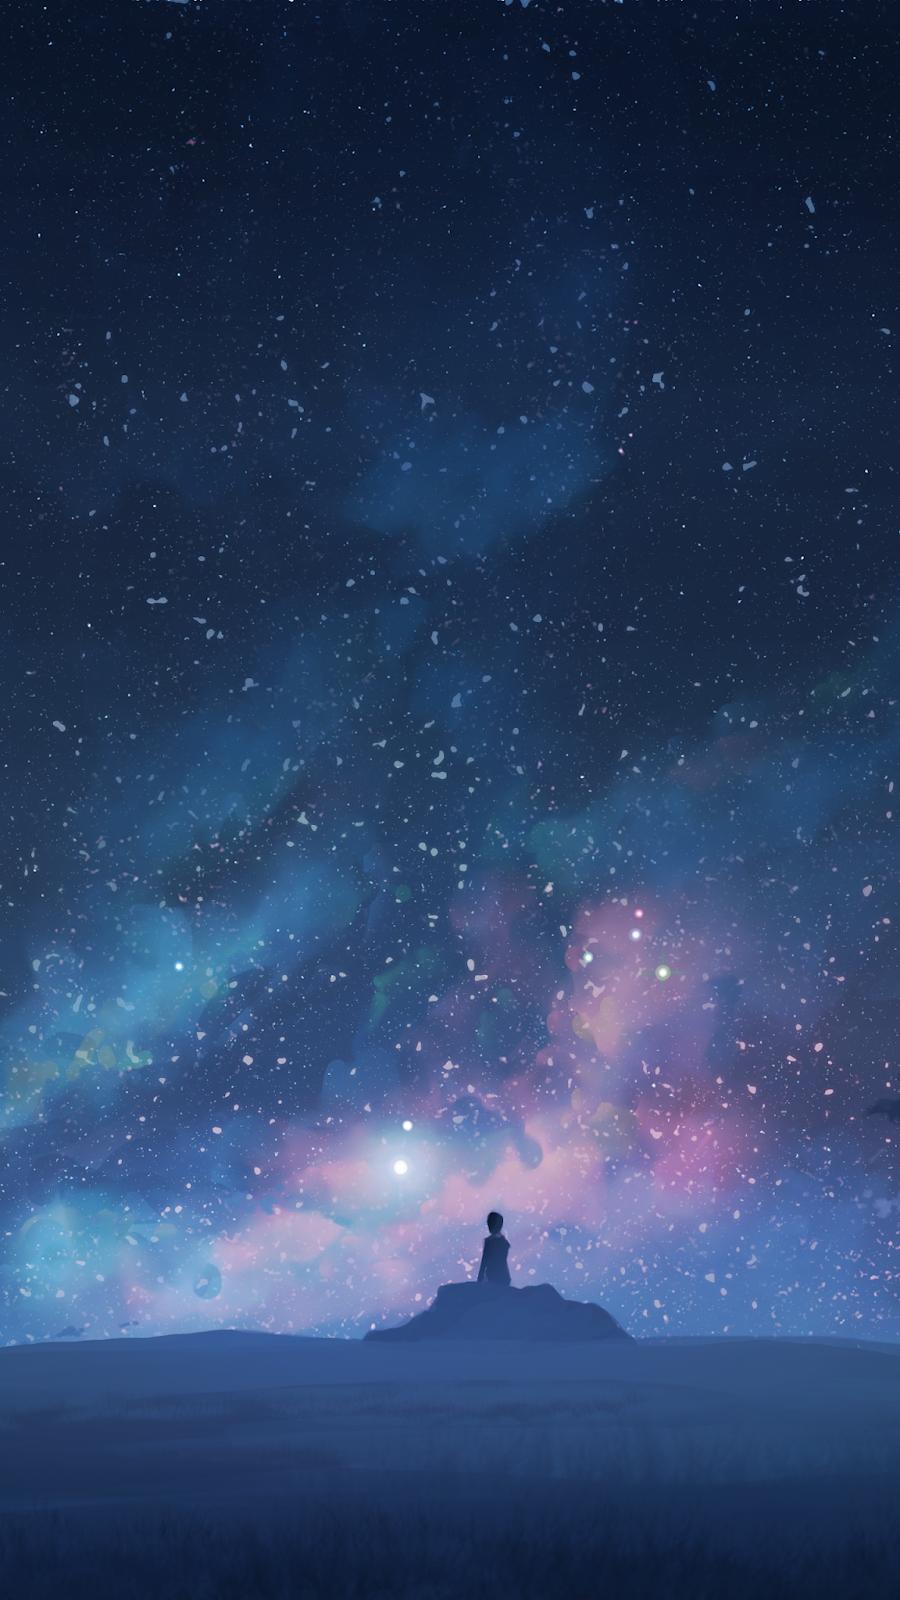 Starry night in 2020 Starry night wallpaper, Pretty